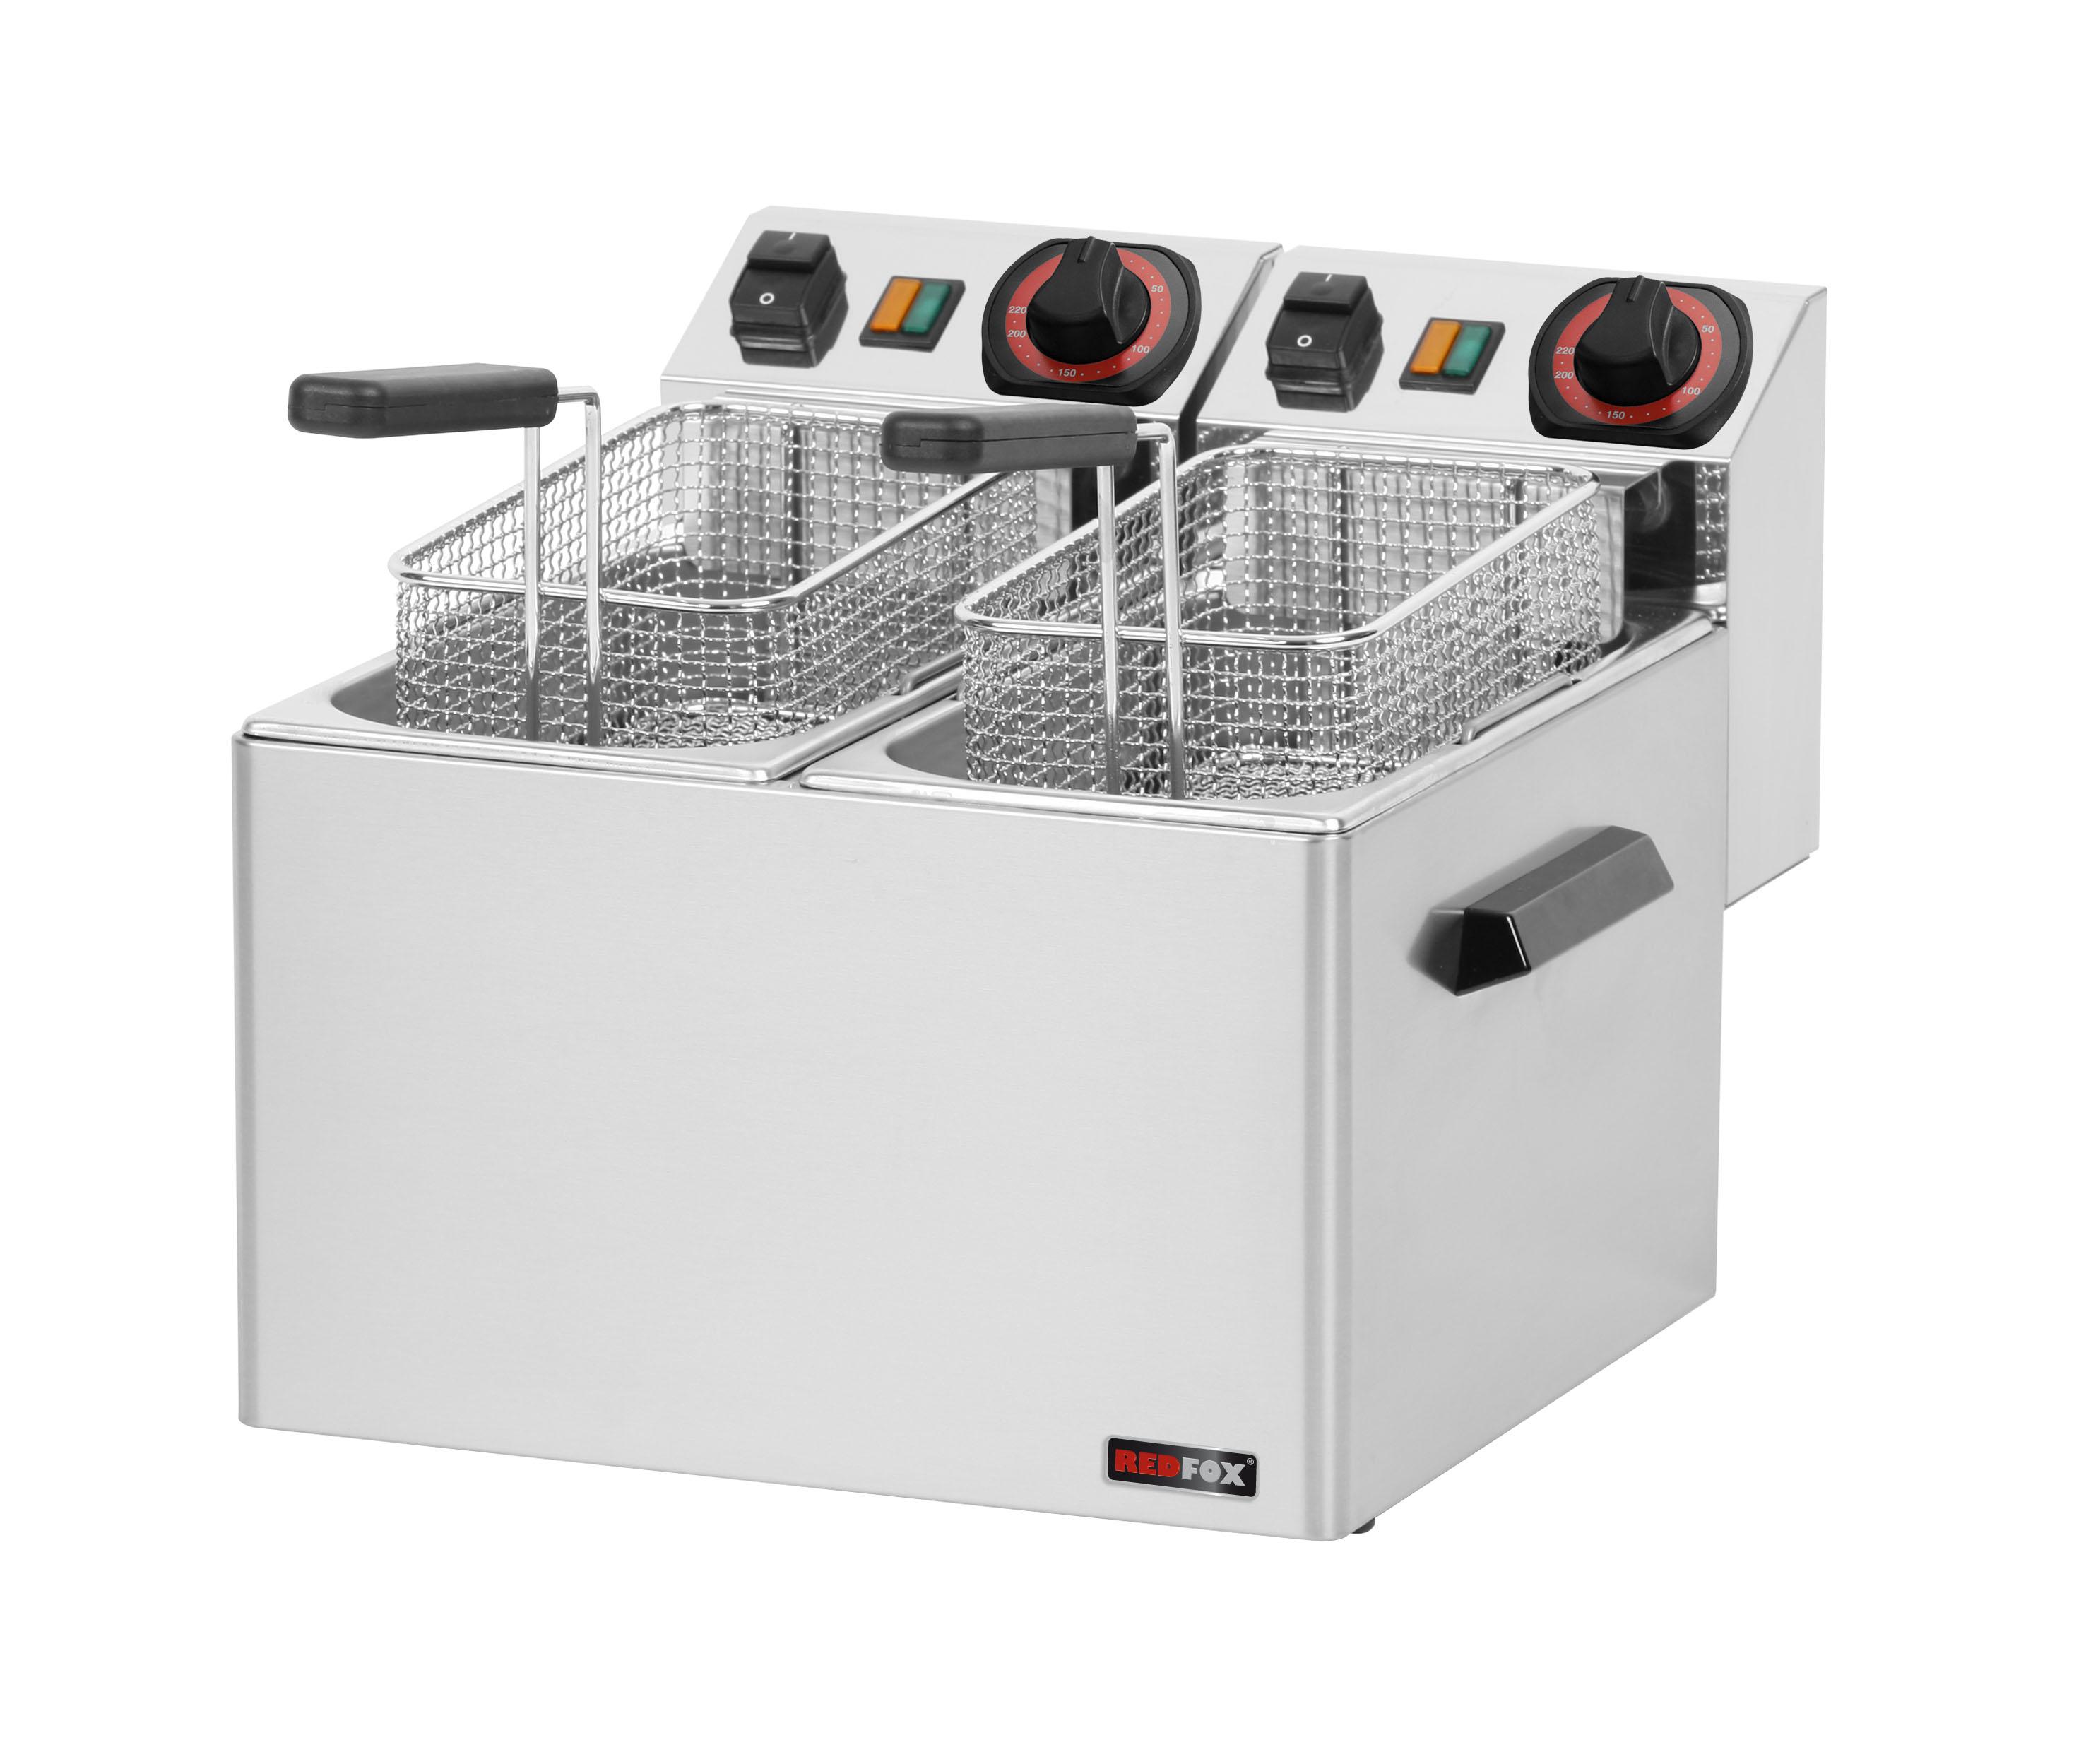 Fritéza elektrická 2x 5 l FE 44 S vyšší výkon REDFOX